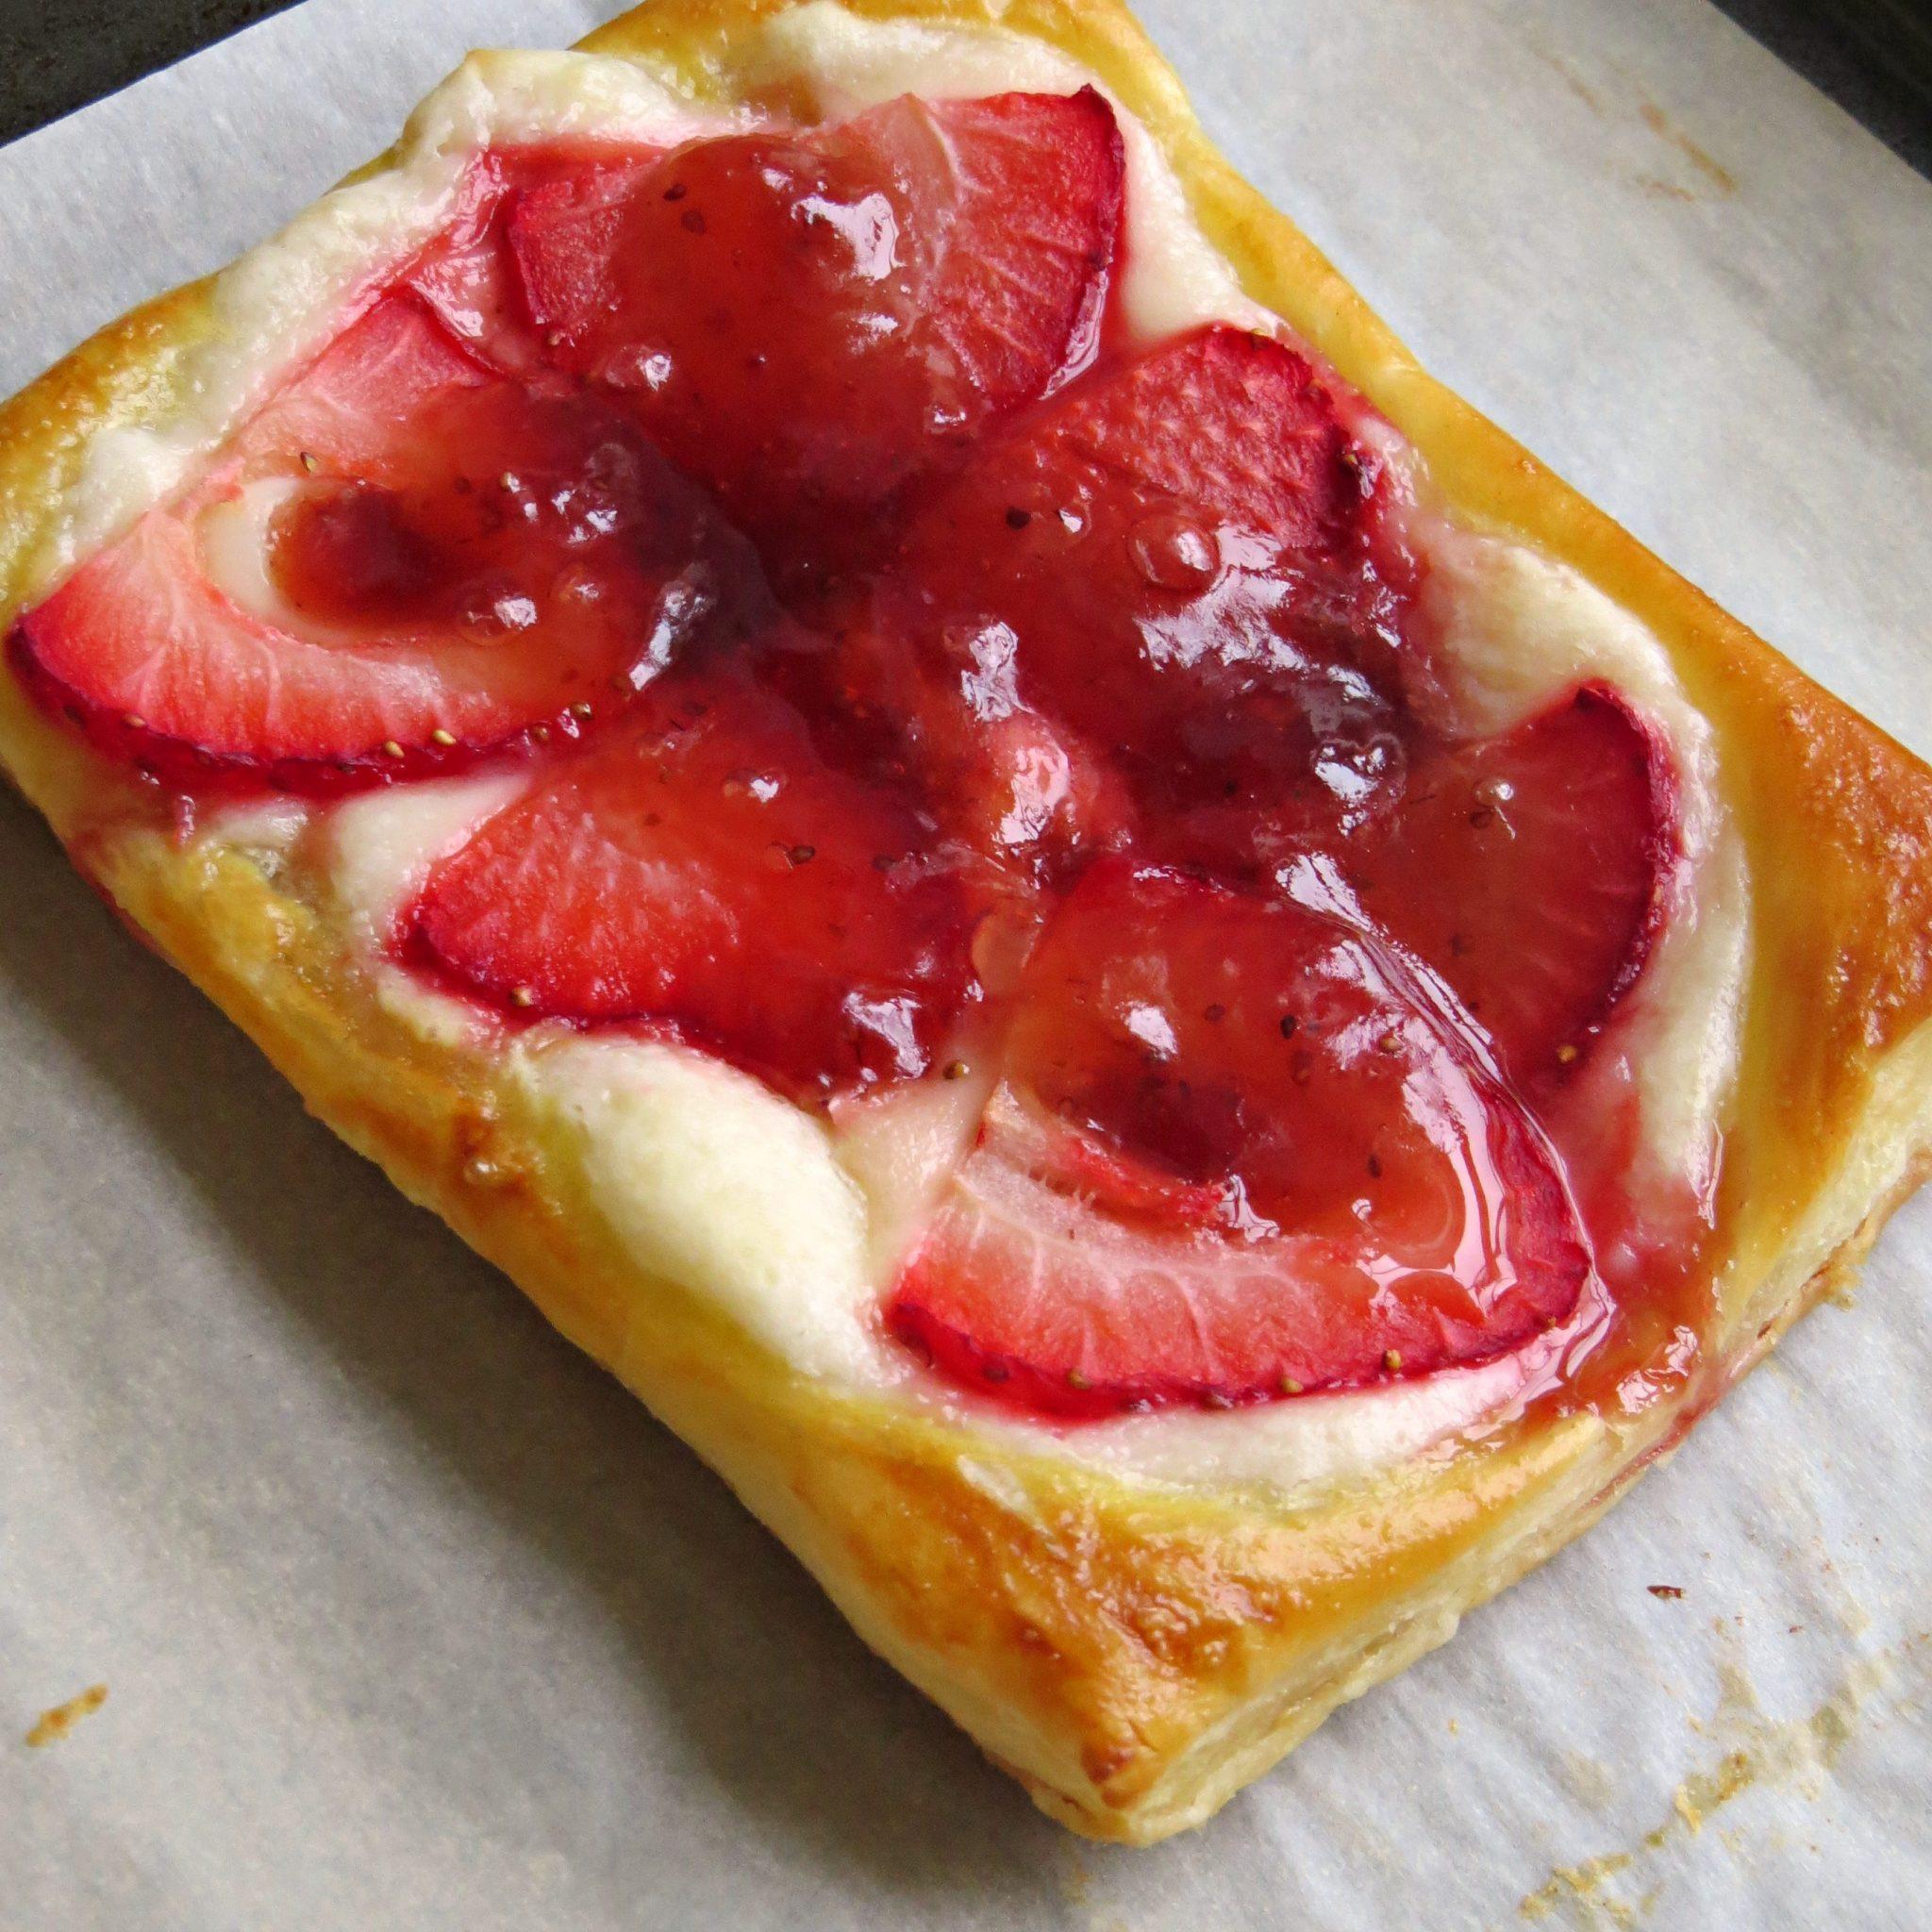 Desserts With Cream Cheese  strawberries and cream cheese dessert